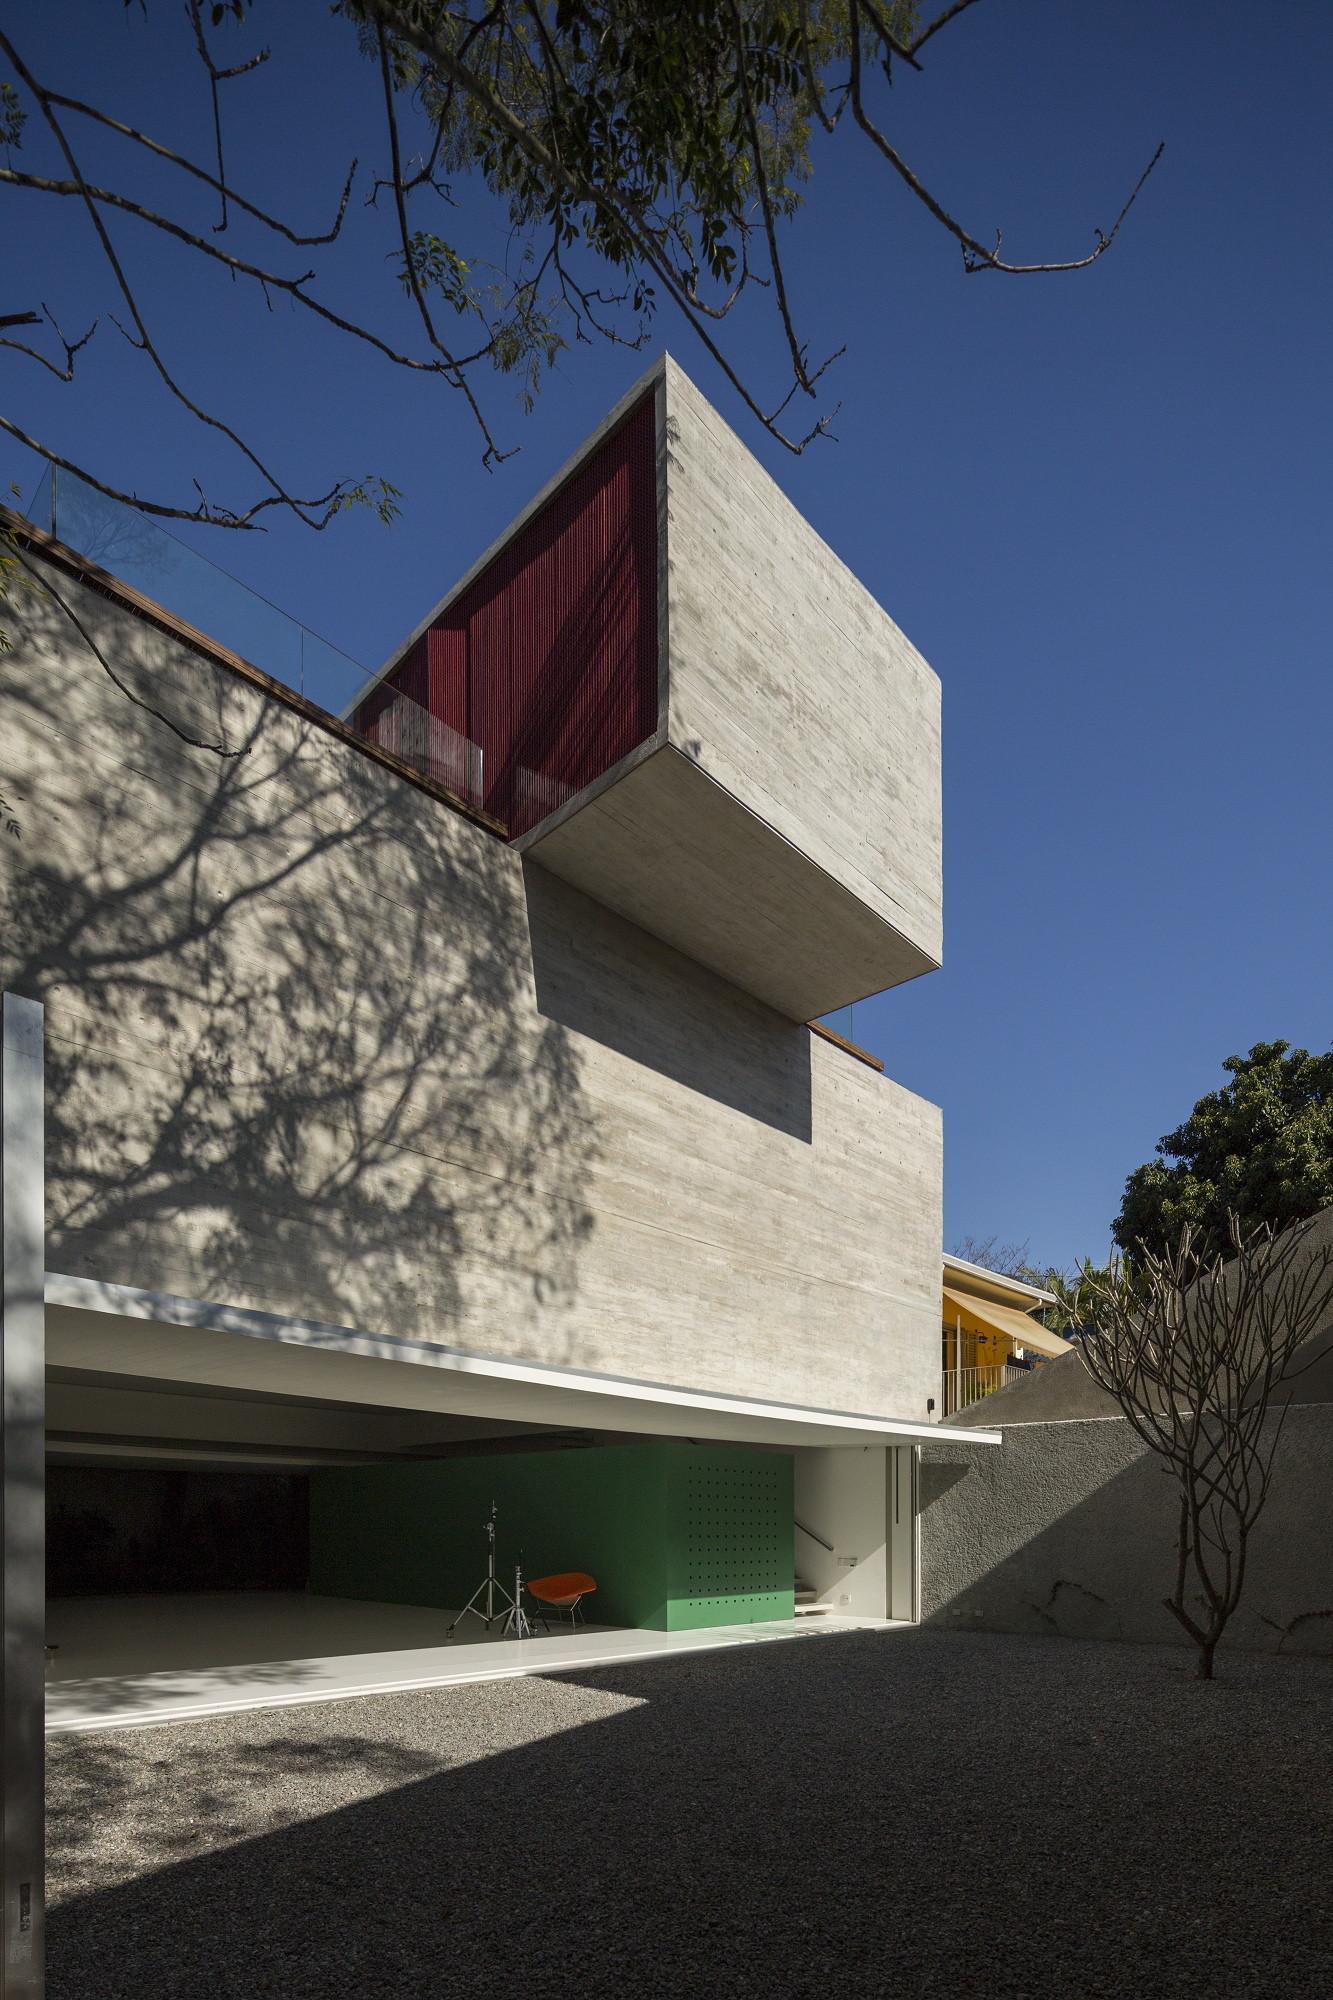 Estudio R / Marcio Kogan, © Fernando Guerra | FG+SG